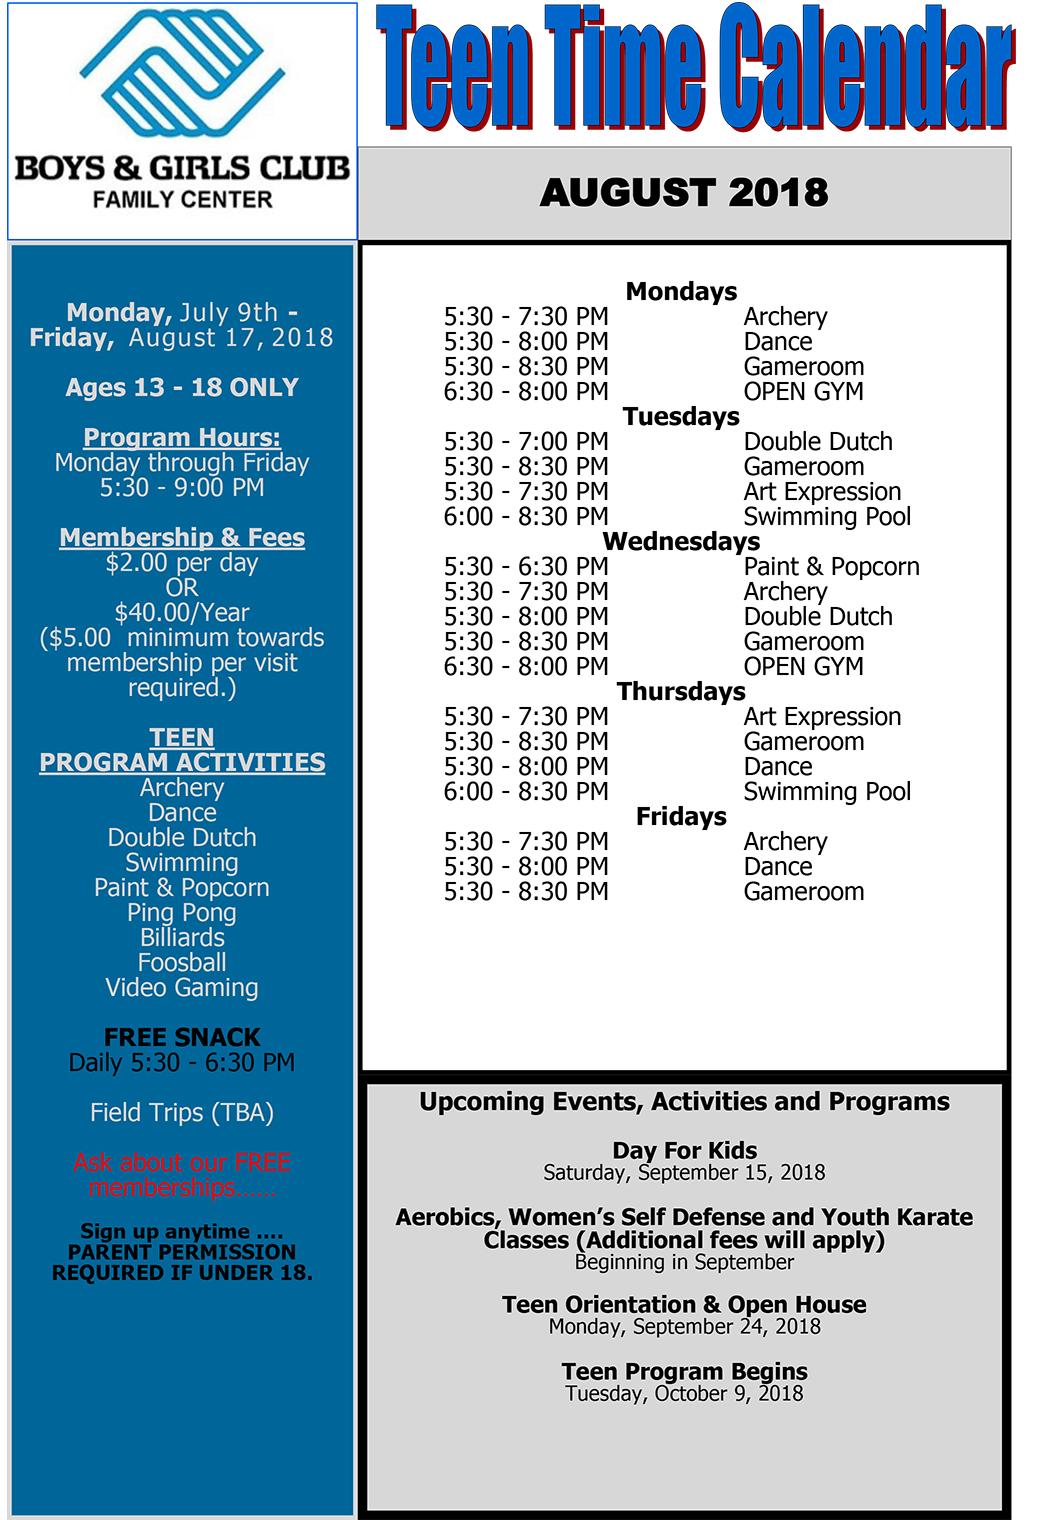 August Teen Summer Program Calendar | Boys & Girls Club Throughout Boys And Girls Club Calender For Meetingd